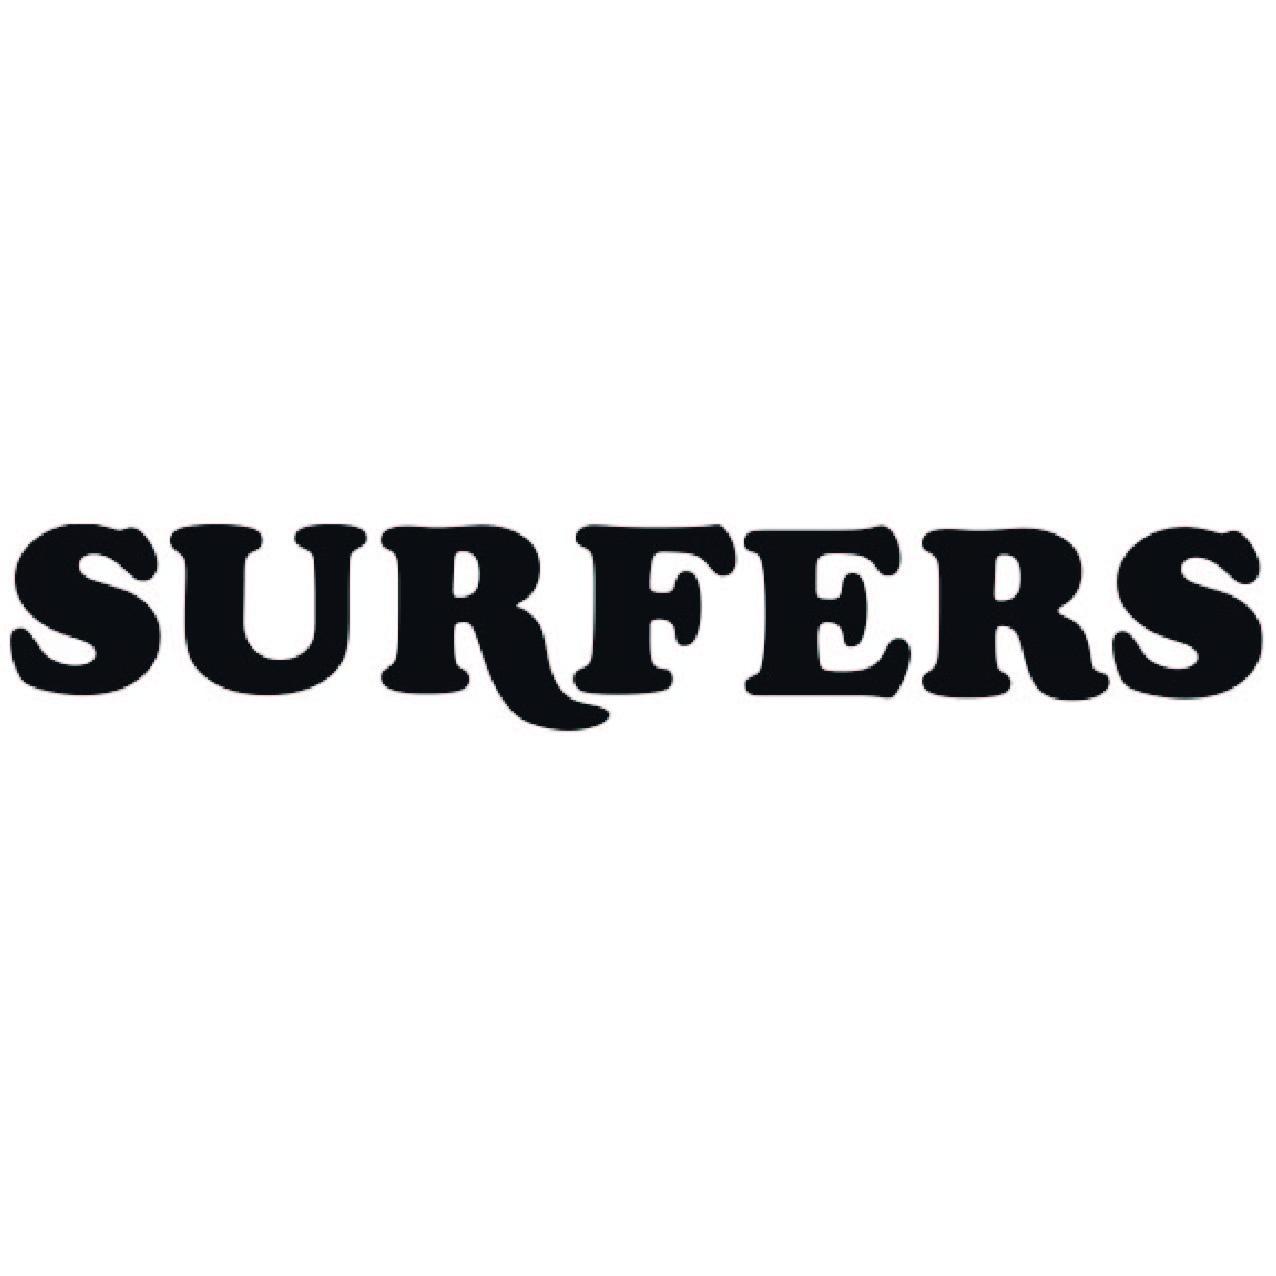 Surfers logga hemsida 2.jpg